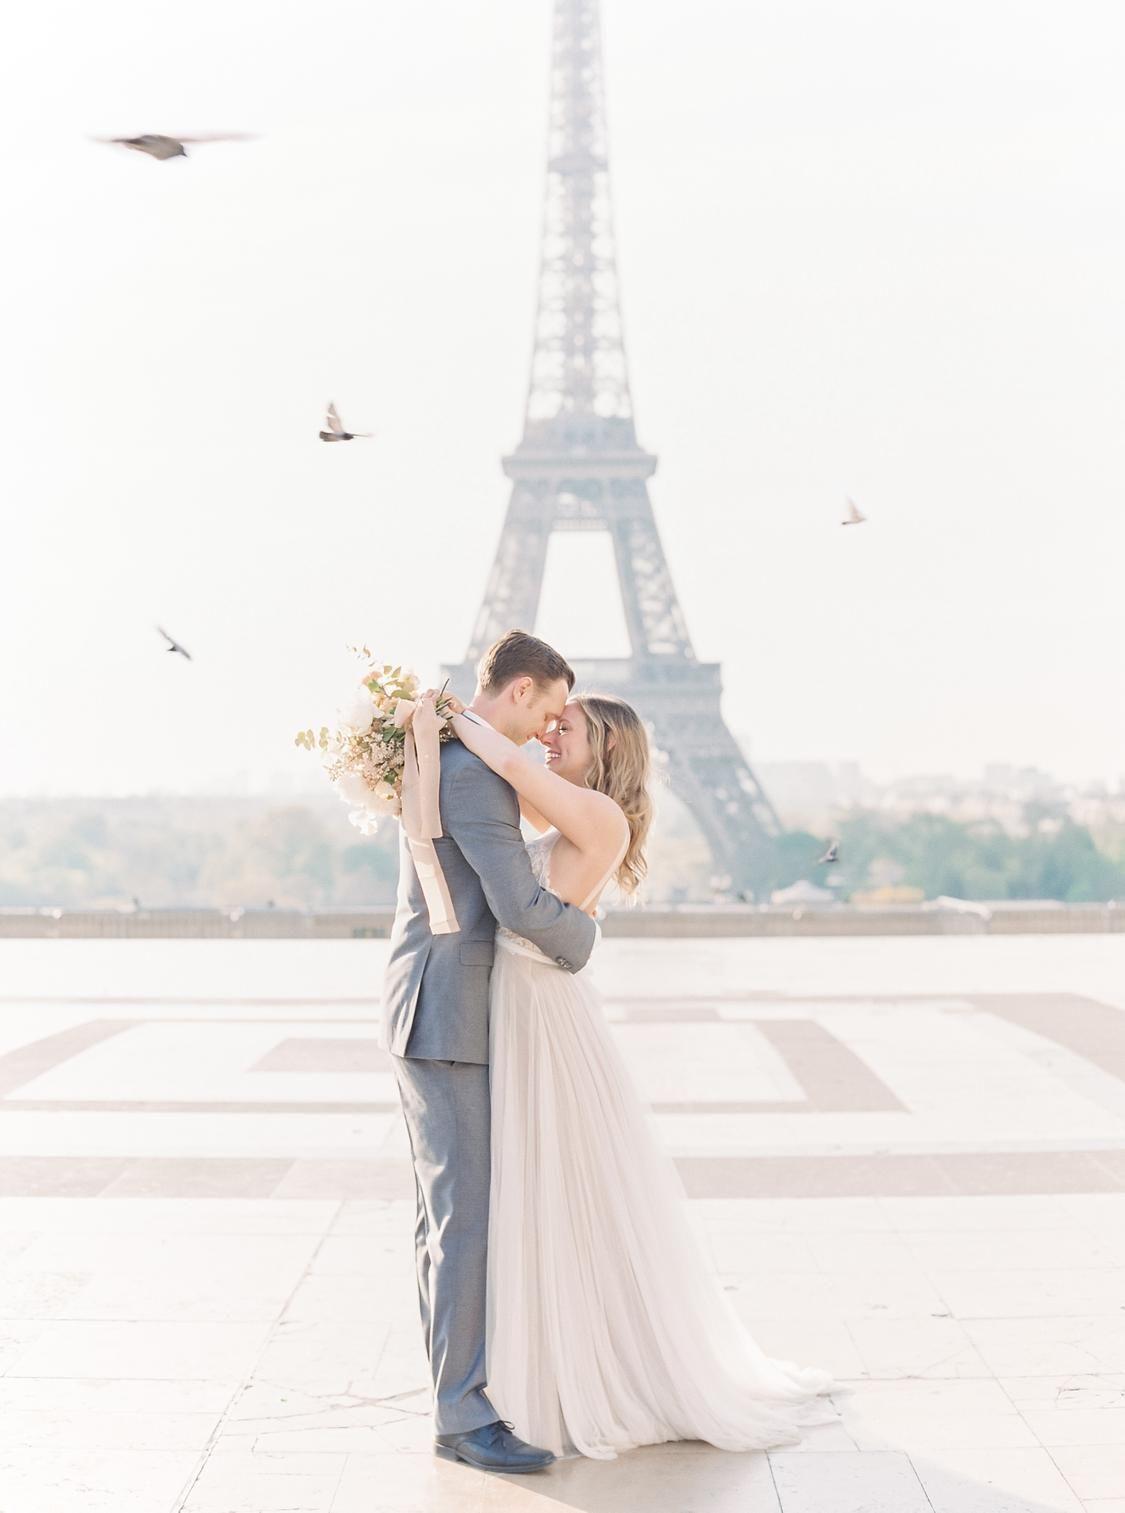 This Romantic Spring Elopement In Paris Is Every Girl S Dream Paris Elopement Film Wedding Photographer Paris Wedding